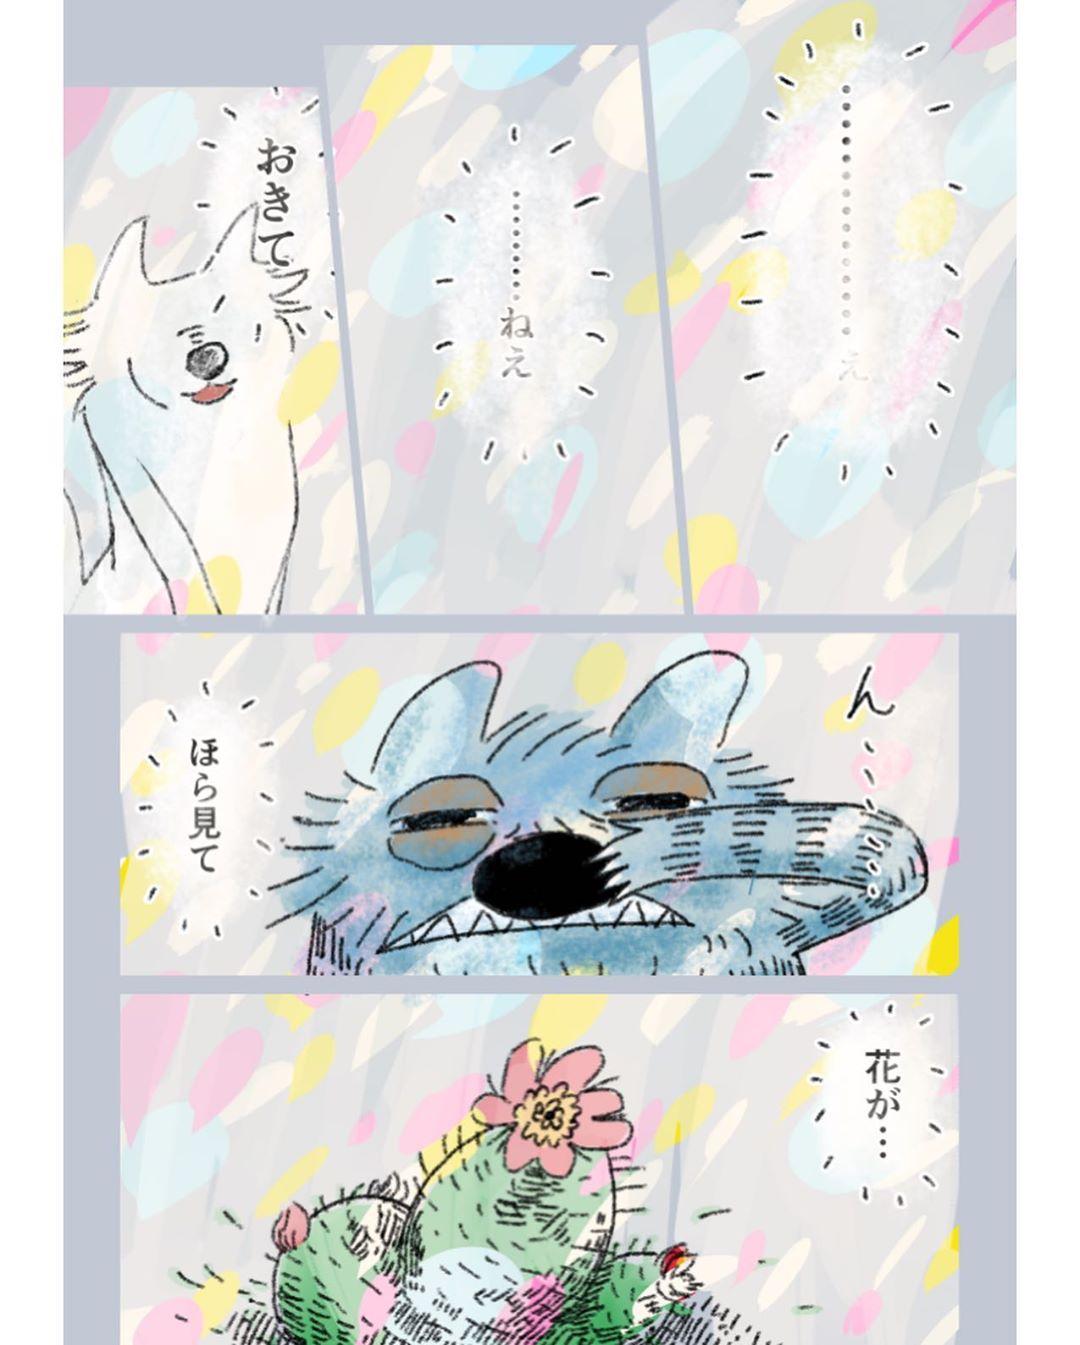 shitara_ryo_tacorice88_75379817_168445837835536_7430593816630498579_n